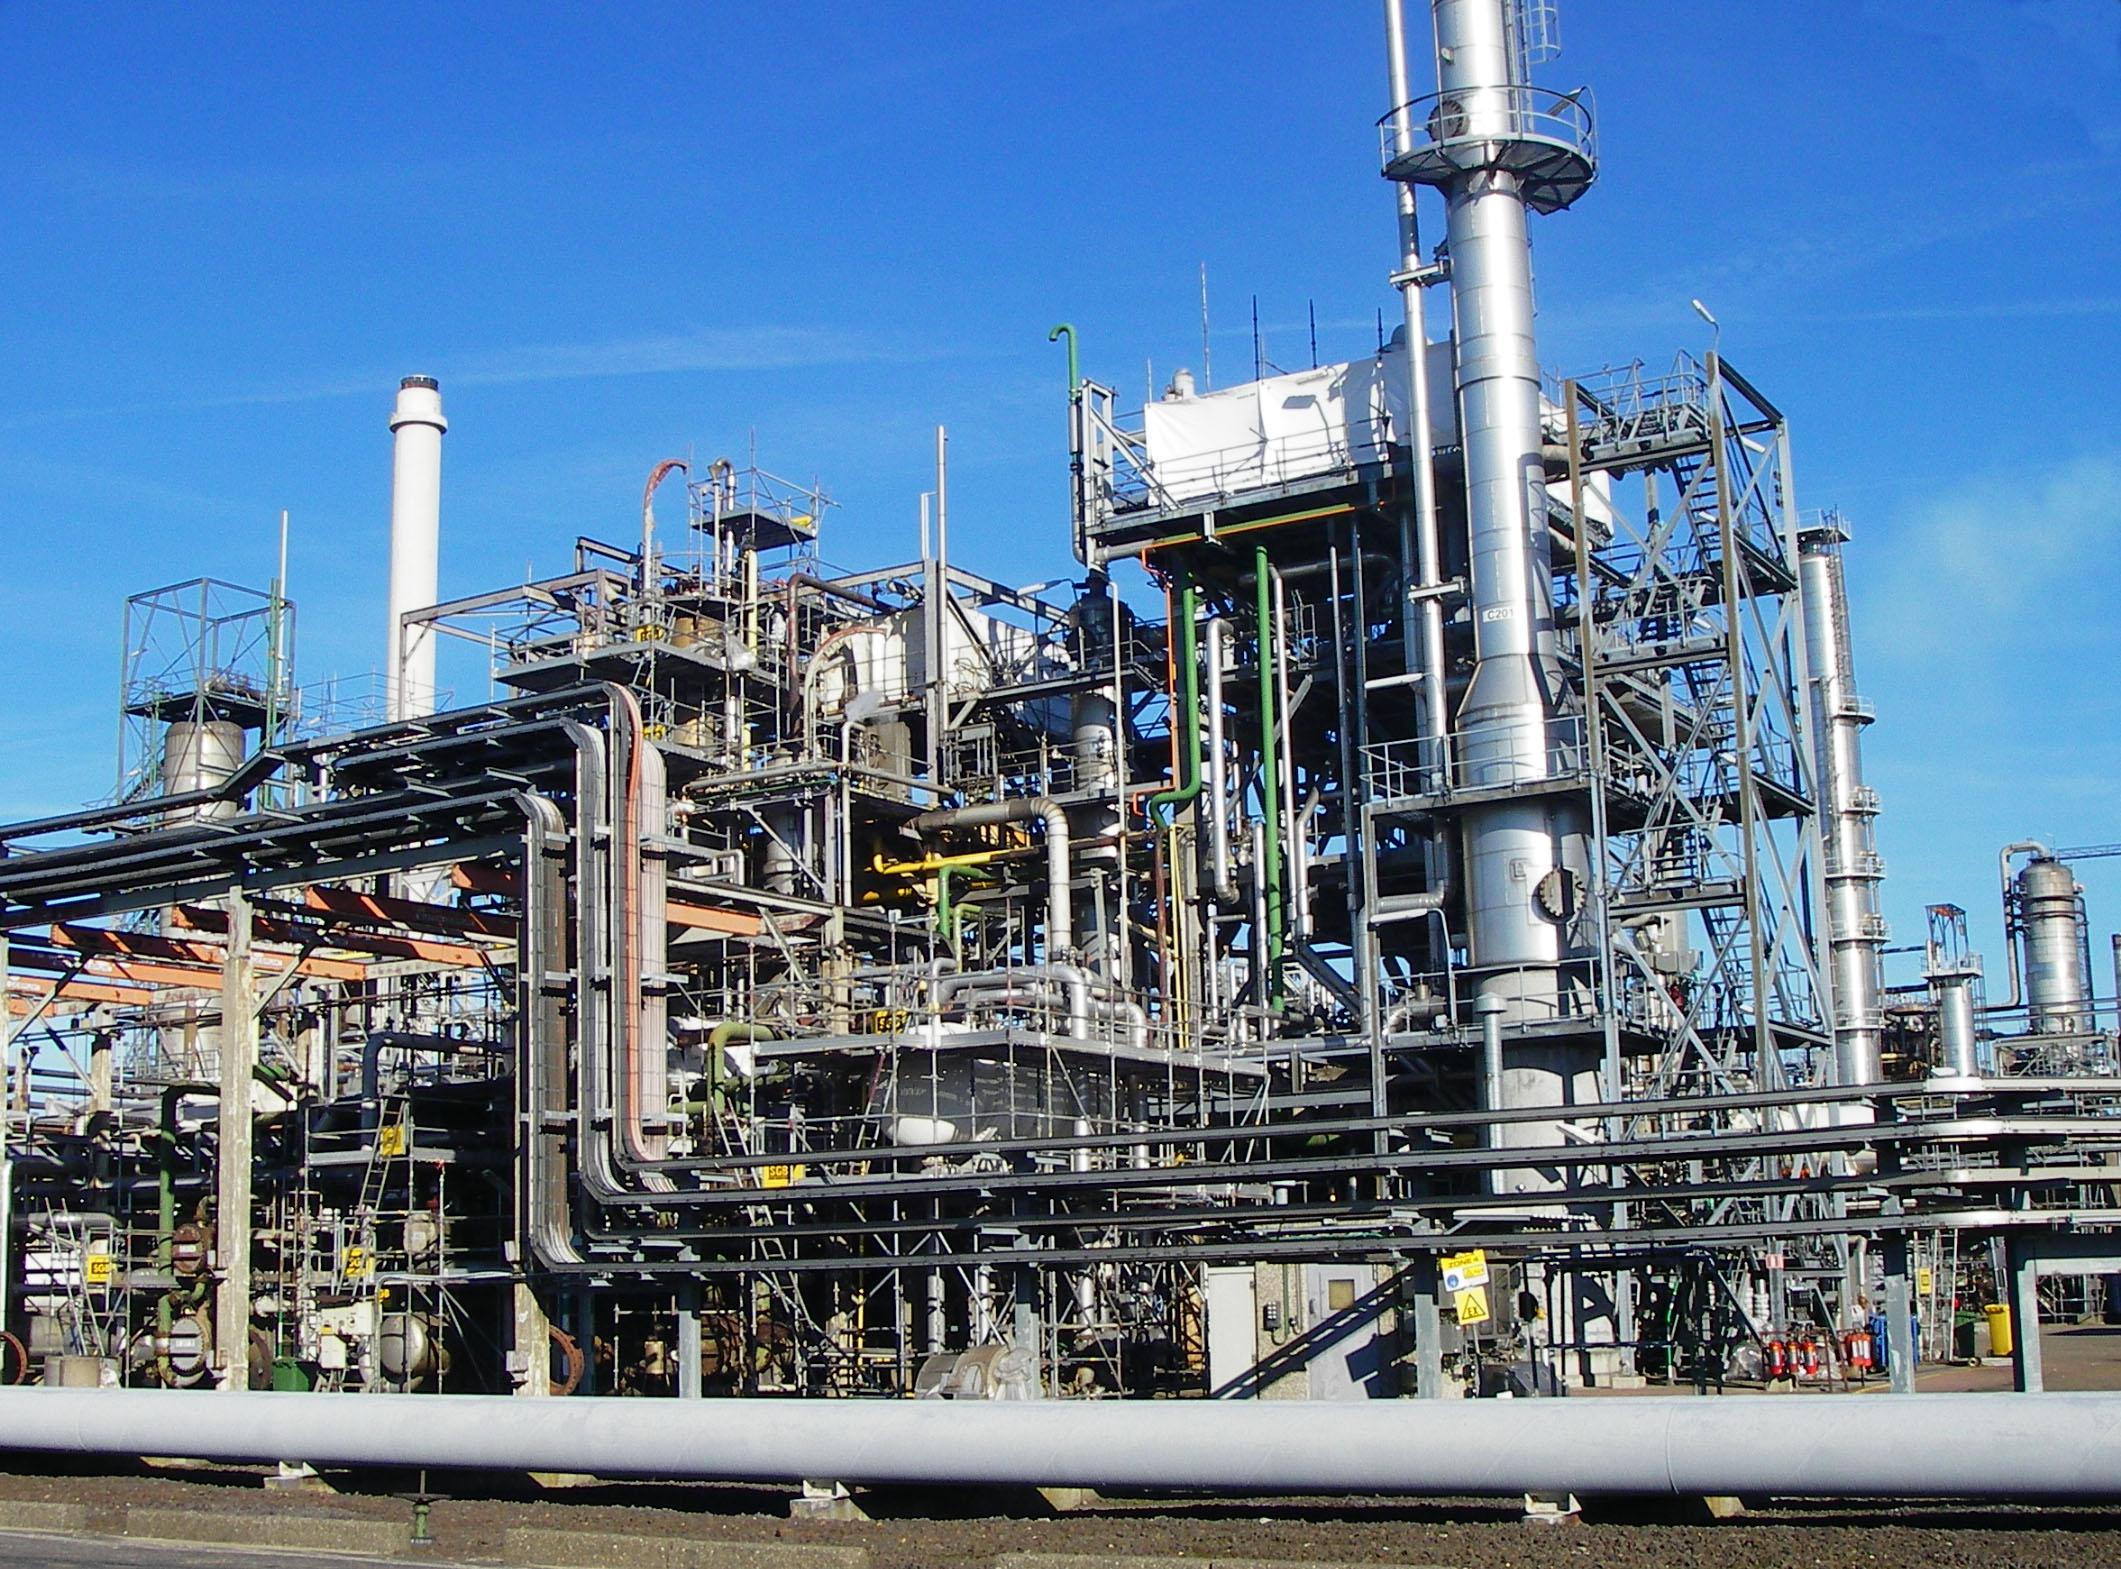 Petchem producers re-evaluate European operations